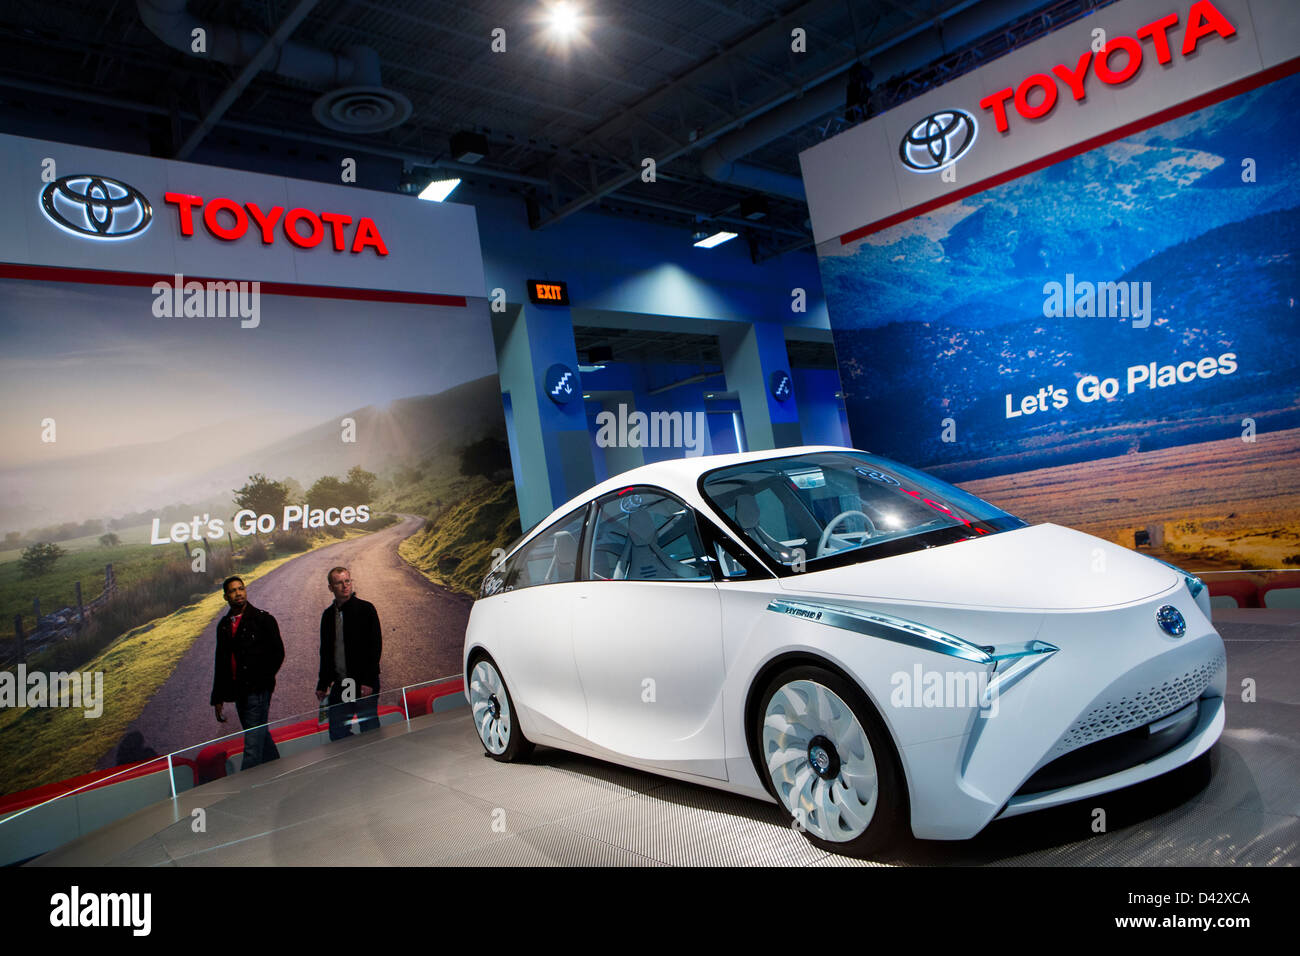 Un Toyota FT-Bh concept car híbrido en exhibición en el 2013 Washington, DC Auto Show. Imagen De Stock